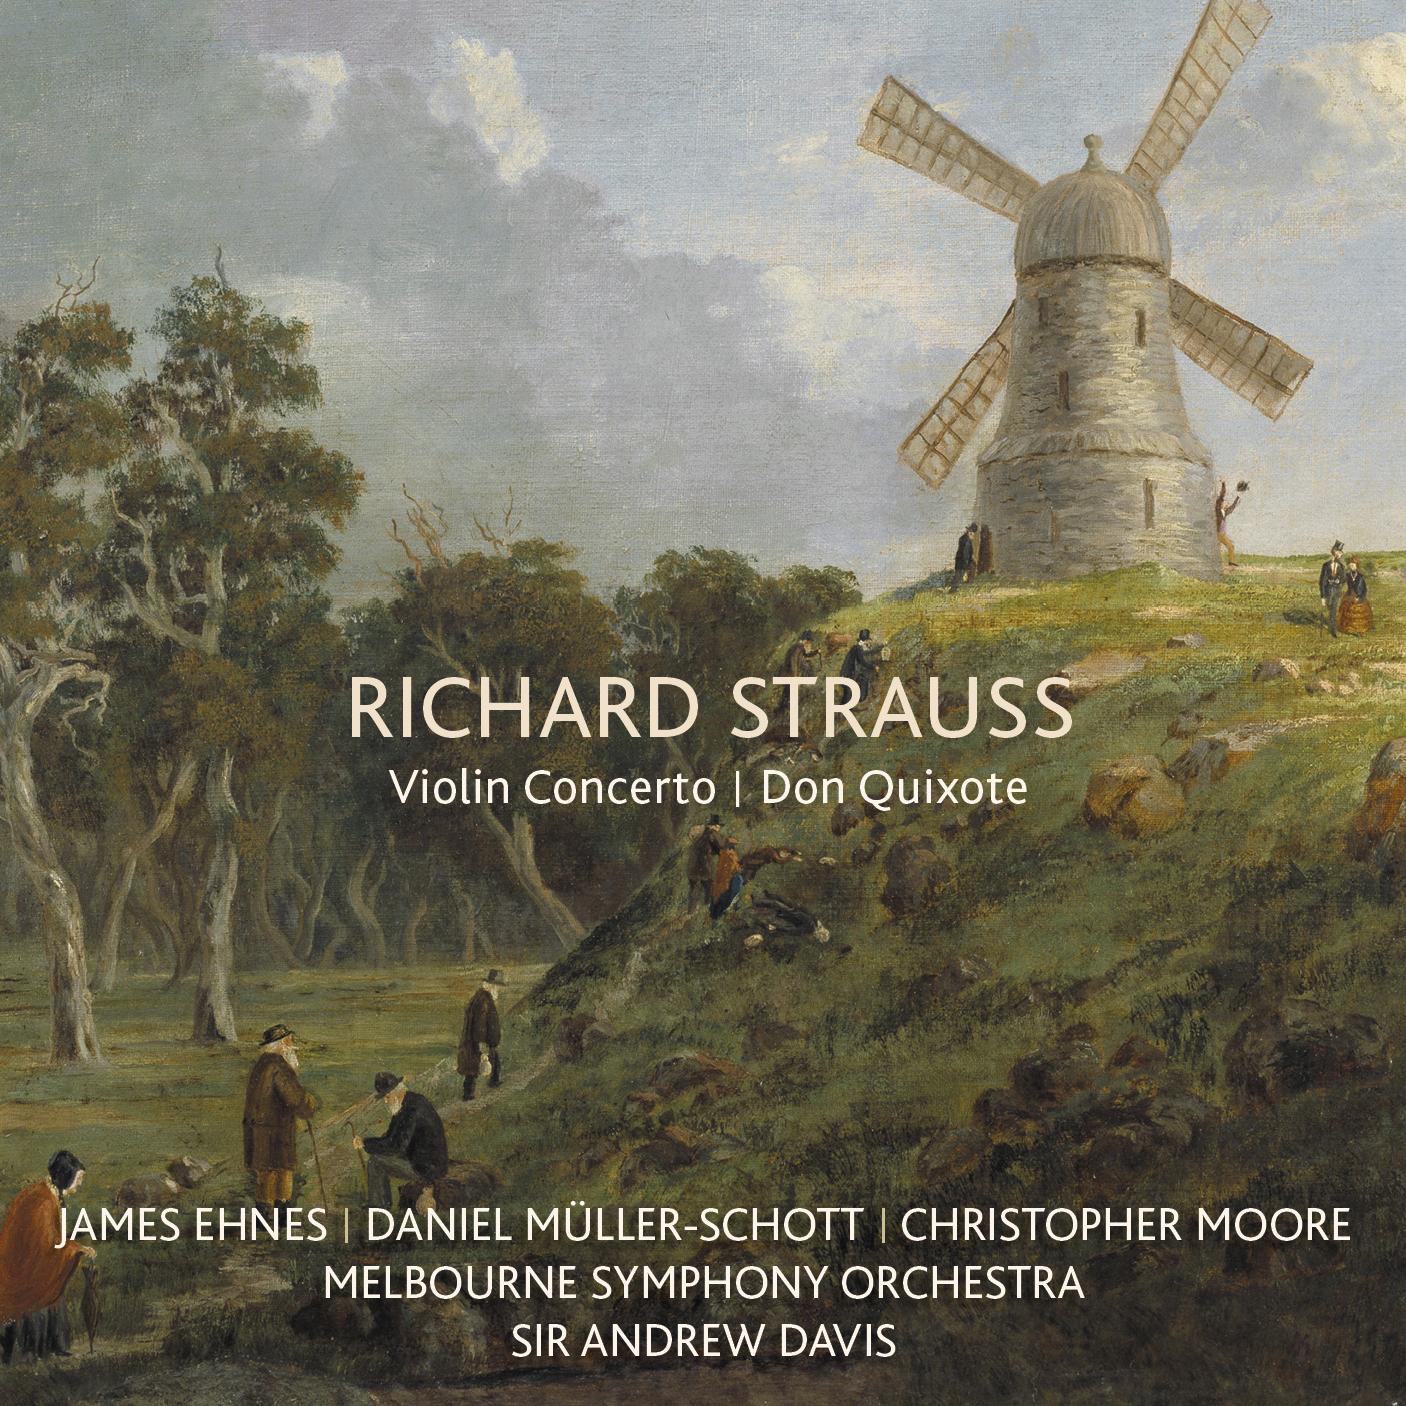 Strauss: Don Quixote, Violin Concerto (Melbourne Symphony